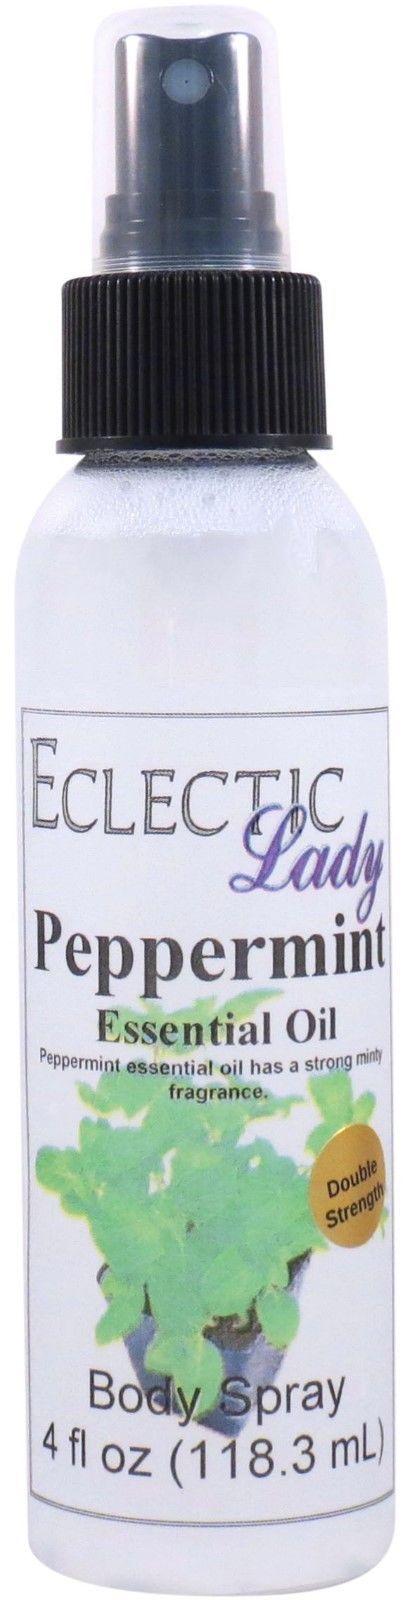 Peppermint Essential Oil  Body Spray